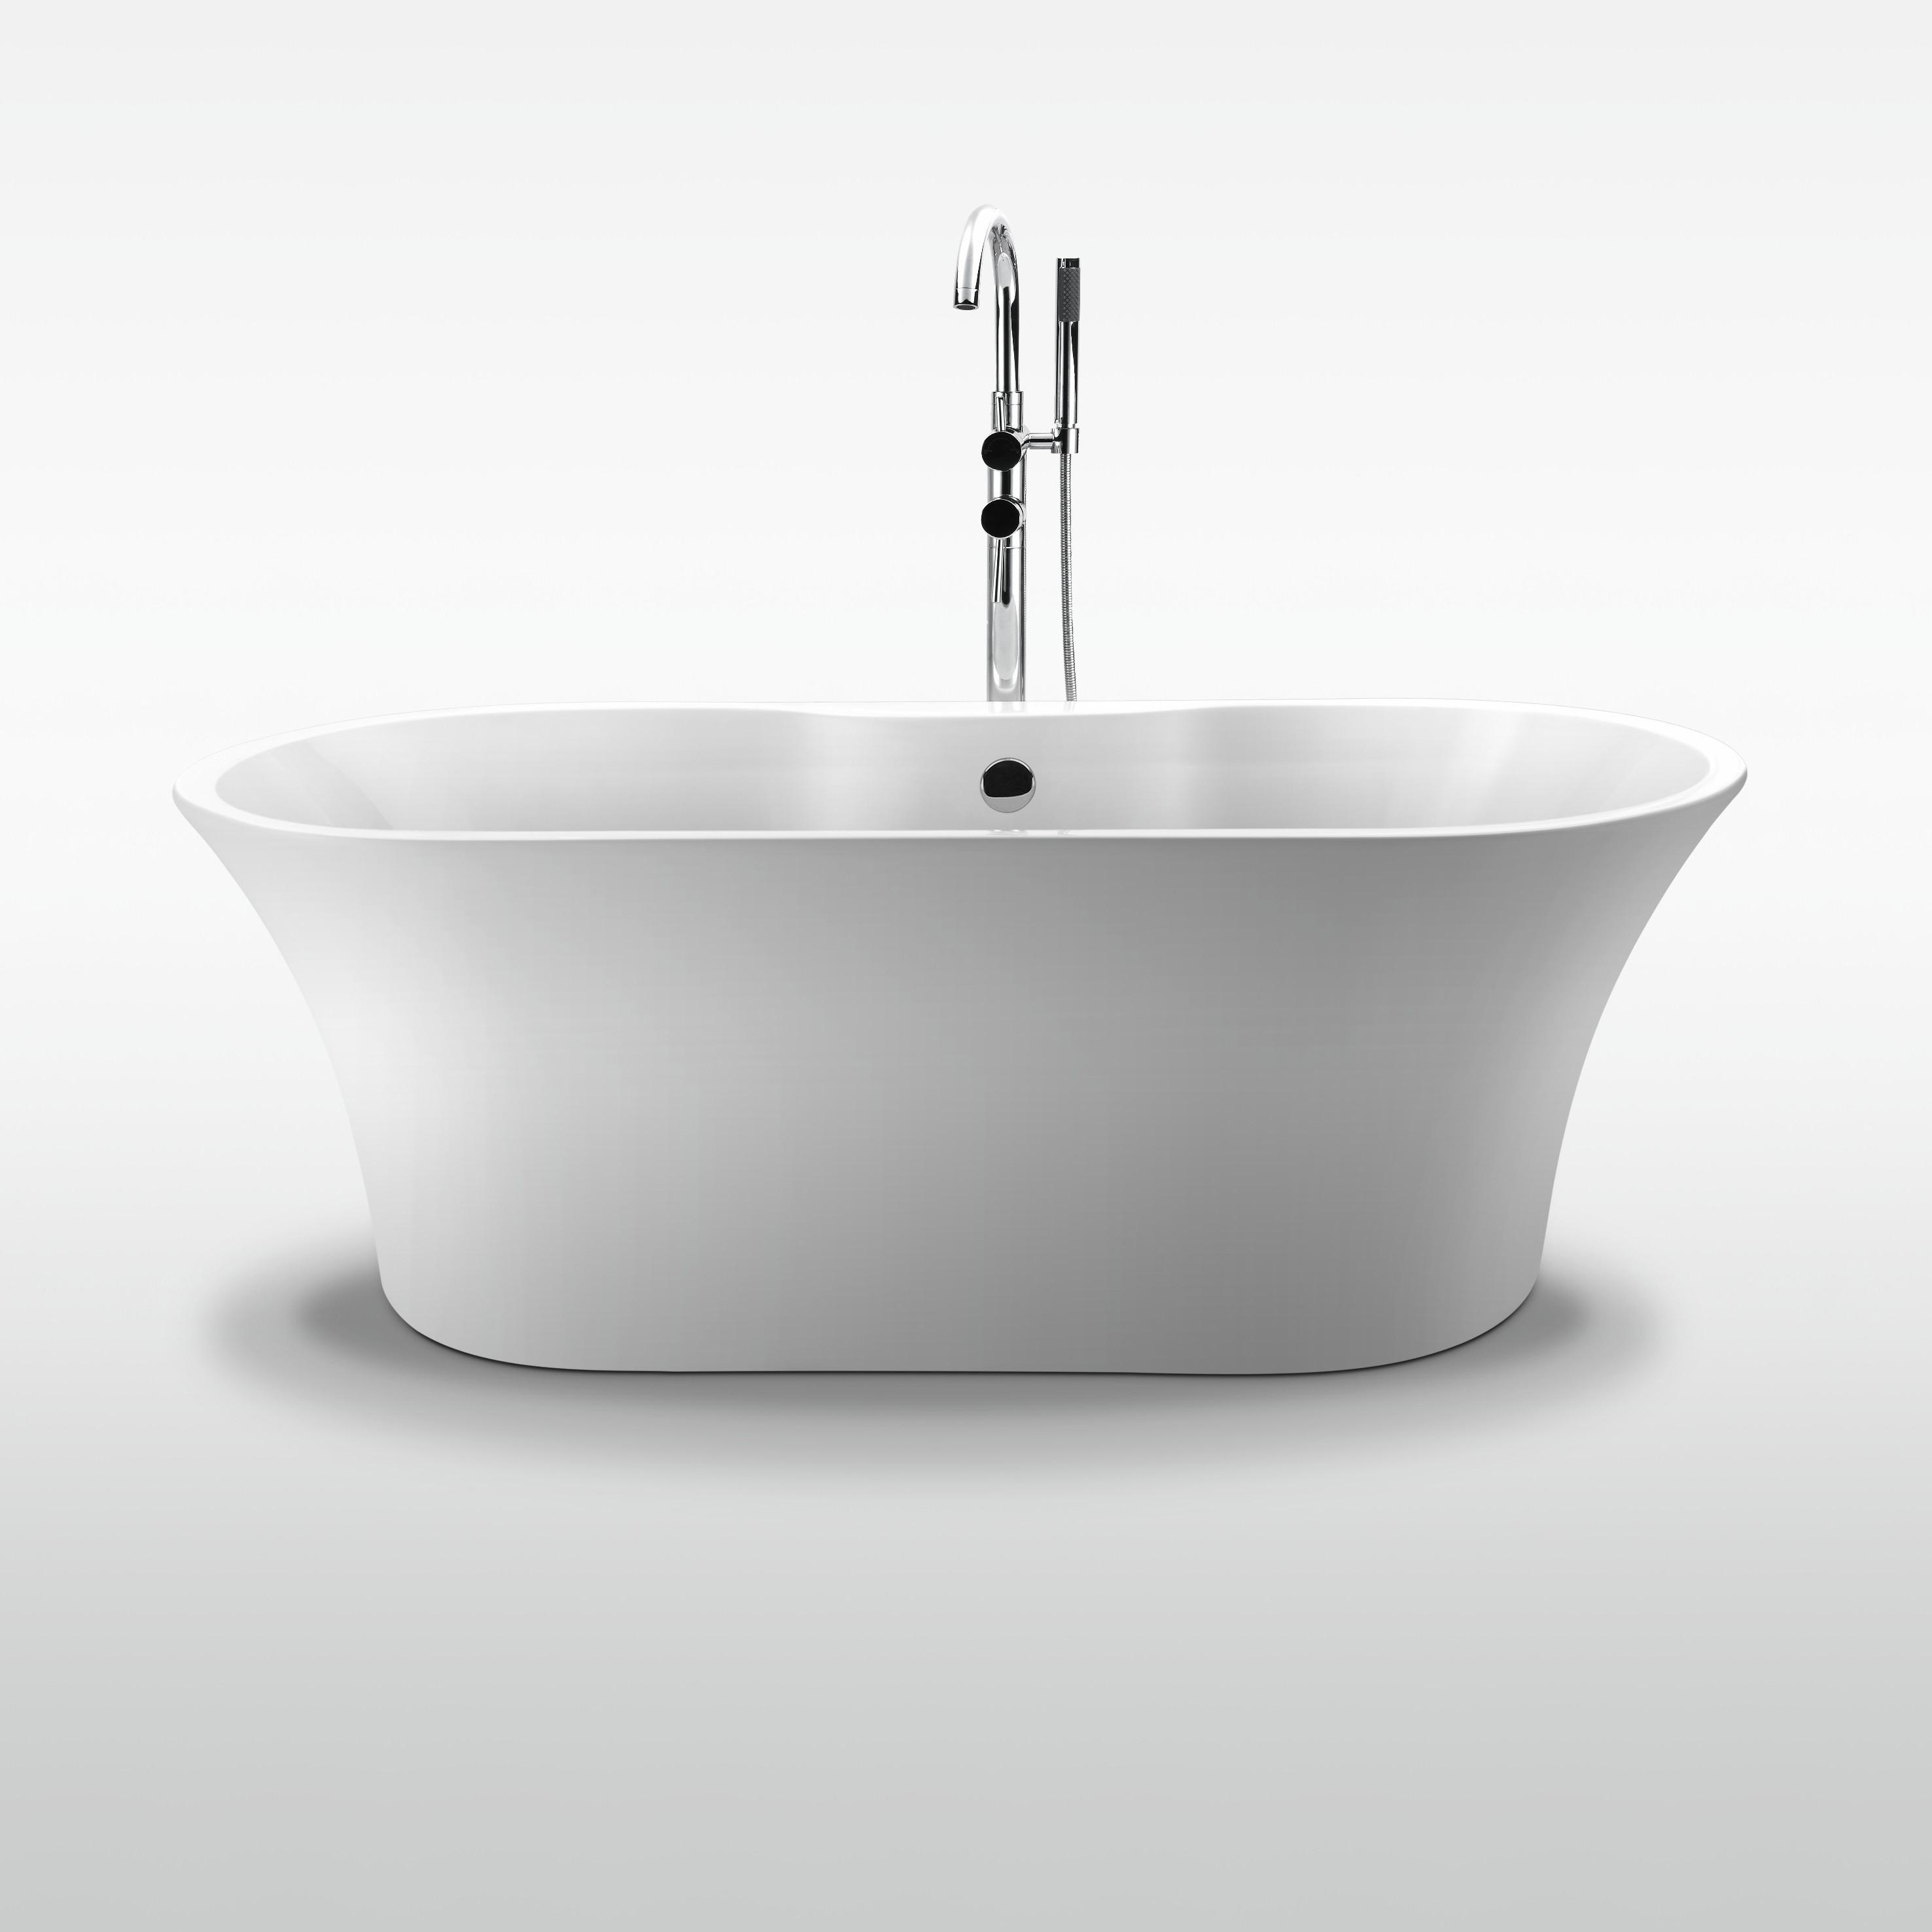 virta tubs viola tub furniture solid bathtub stone bathroom inch canada bathtubs freestanding en luxury surface toronto